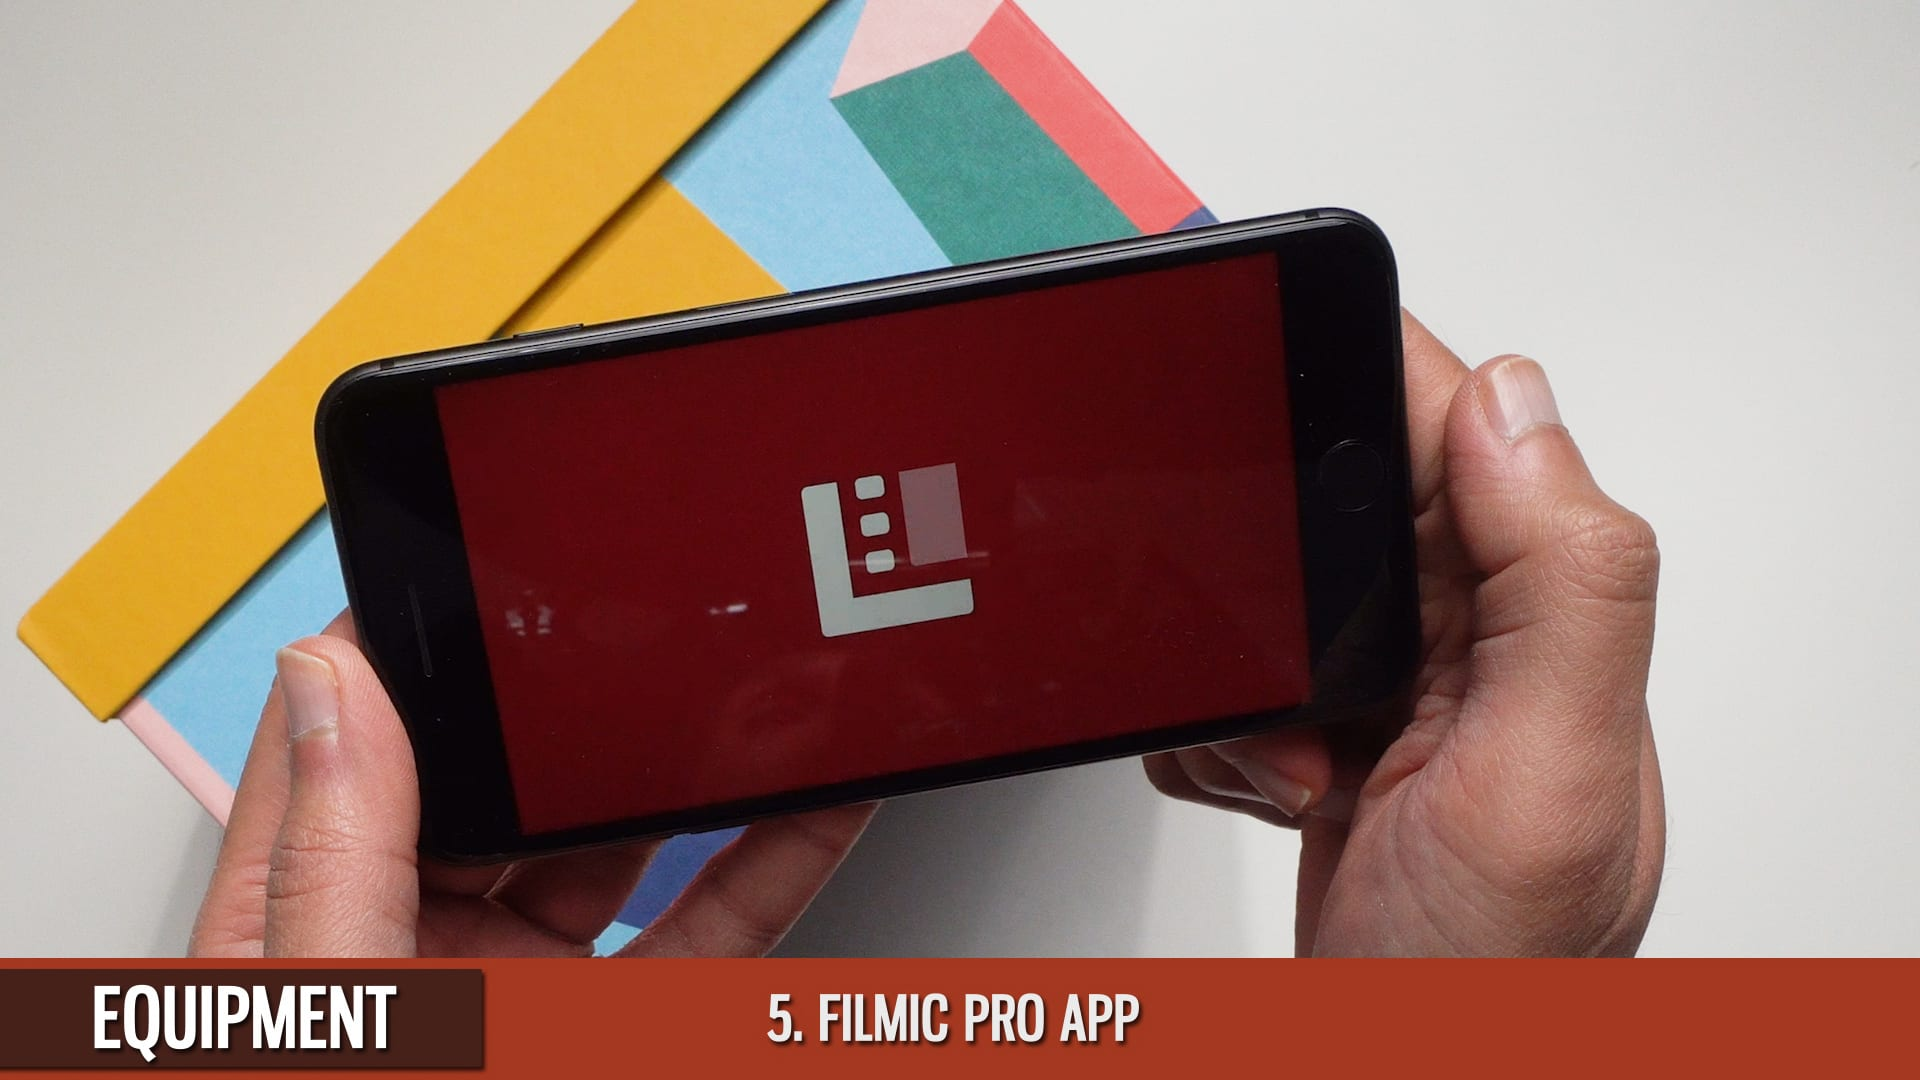 IPhone-Overhead-Filmic-Pro-App